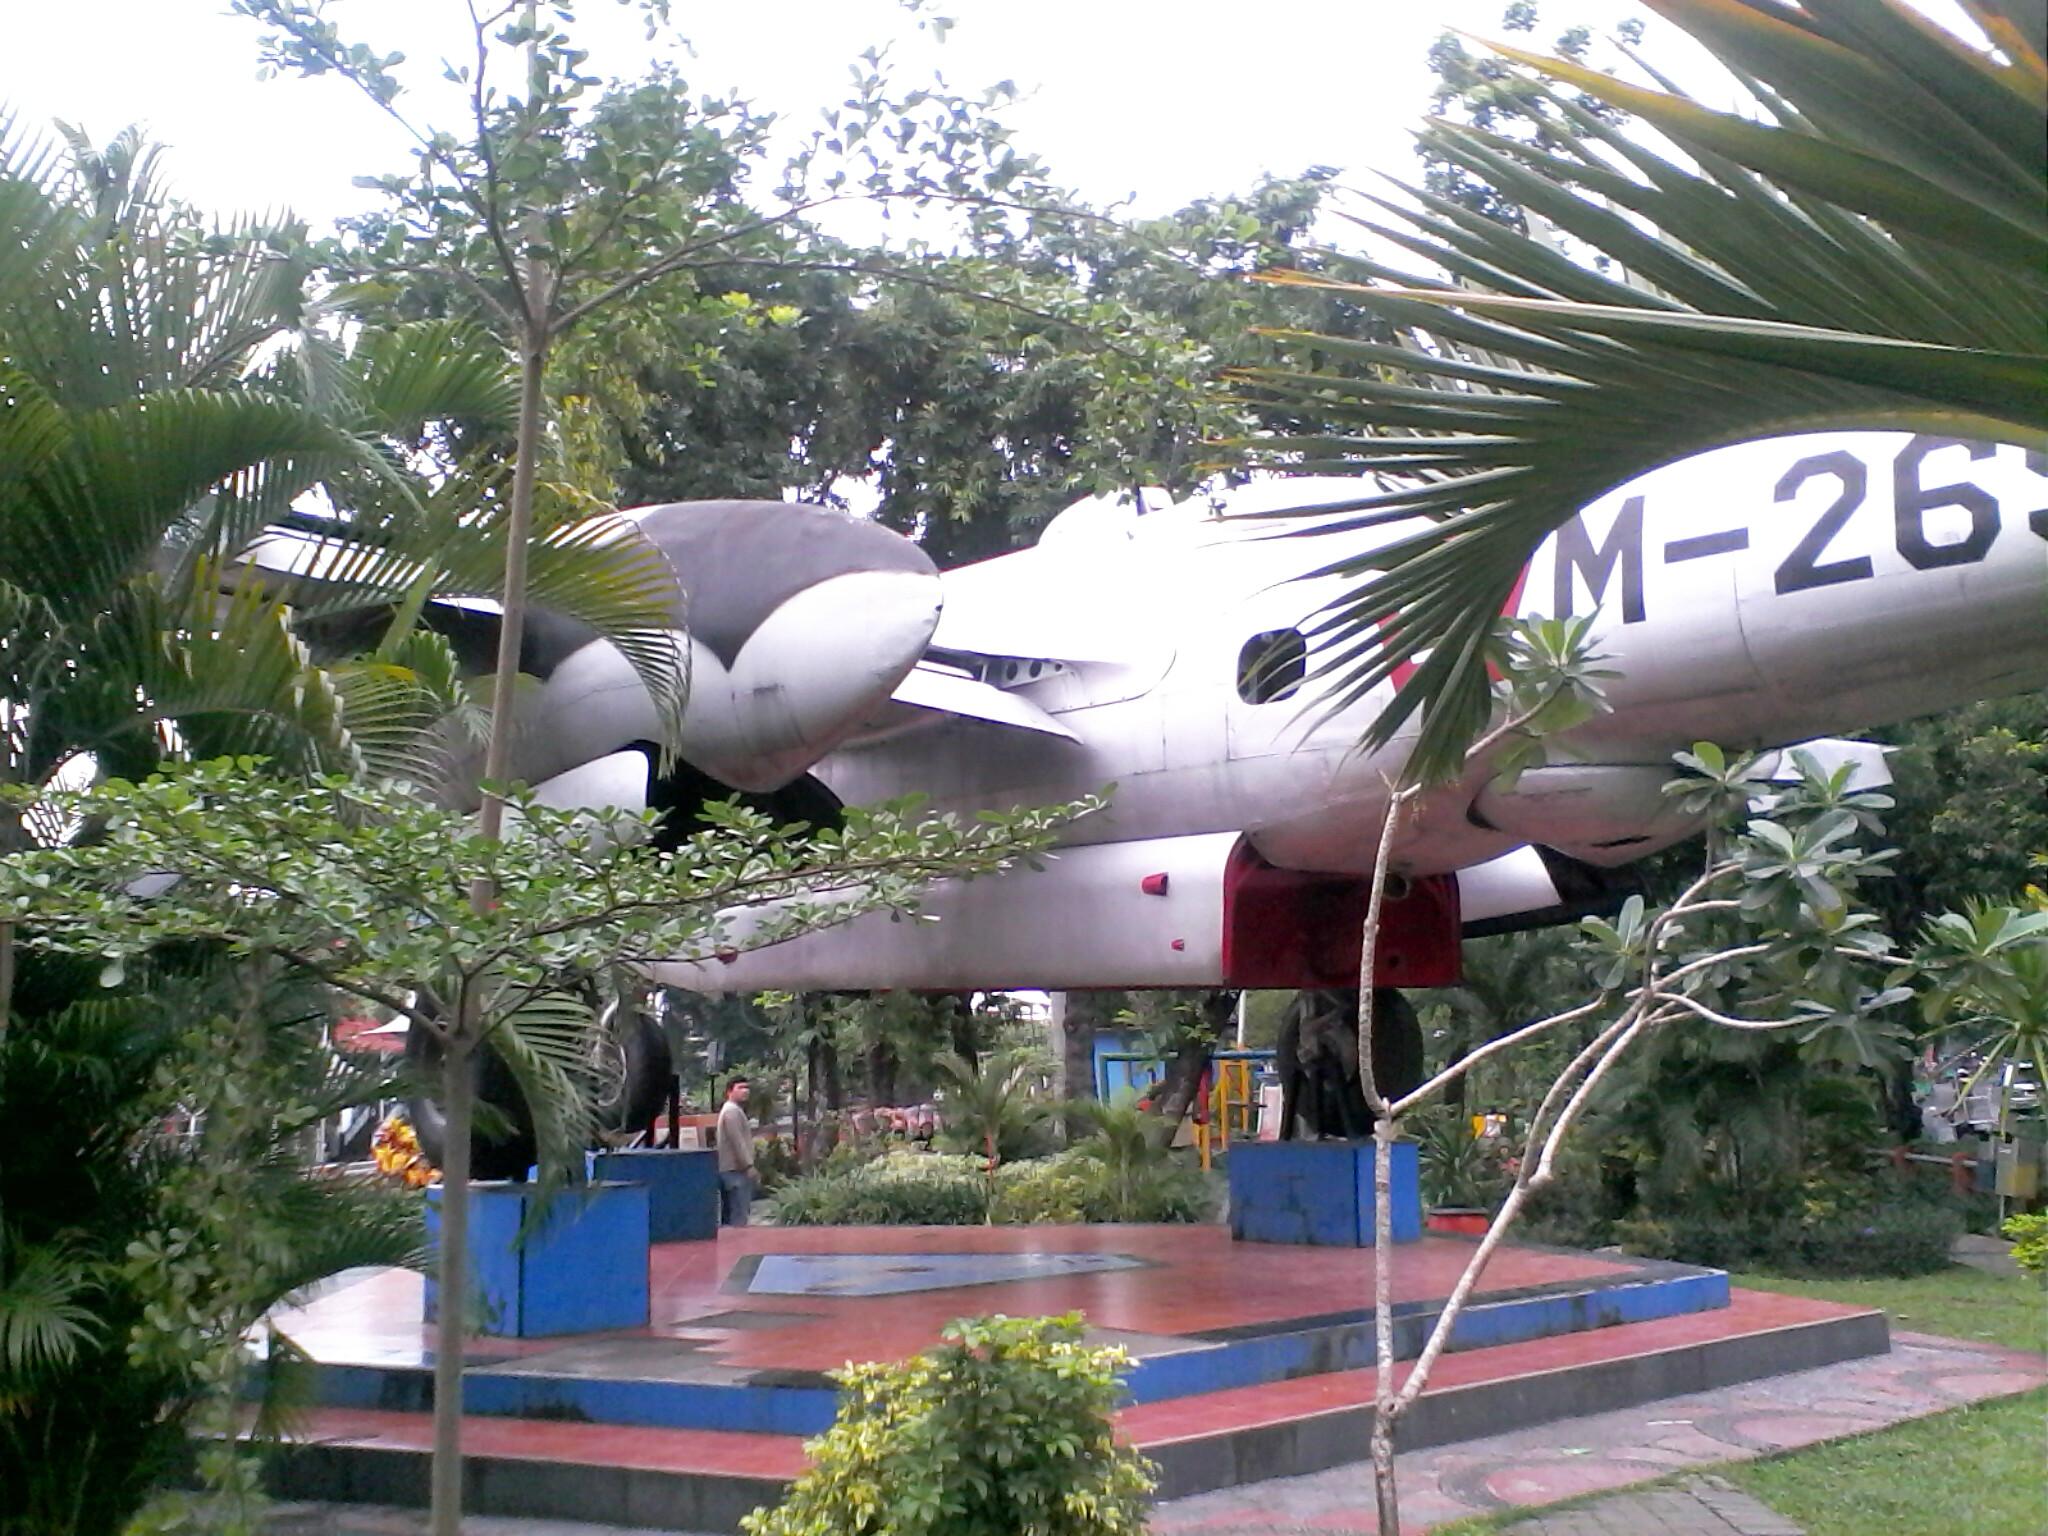 Menyusuri Indahnya Sungai Kalimas Surabaya Hermannusa Monumen Pesawat Bomber 26